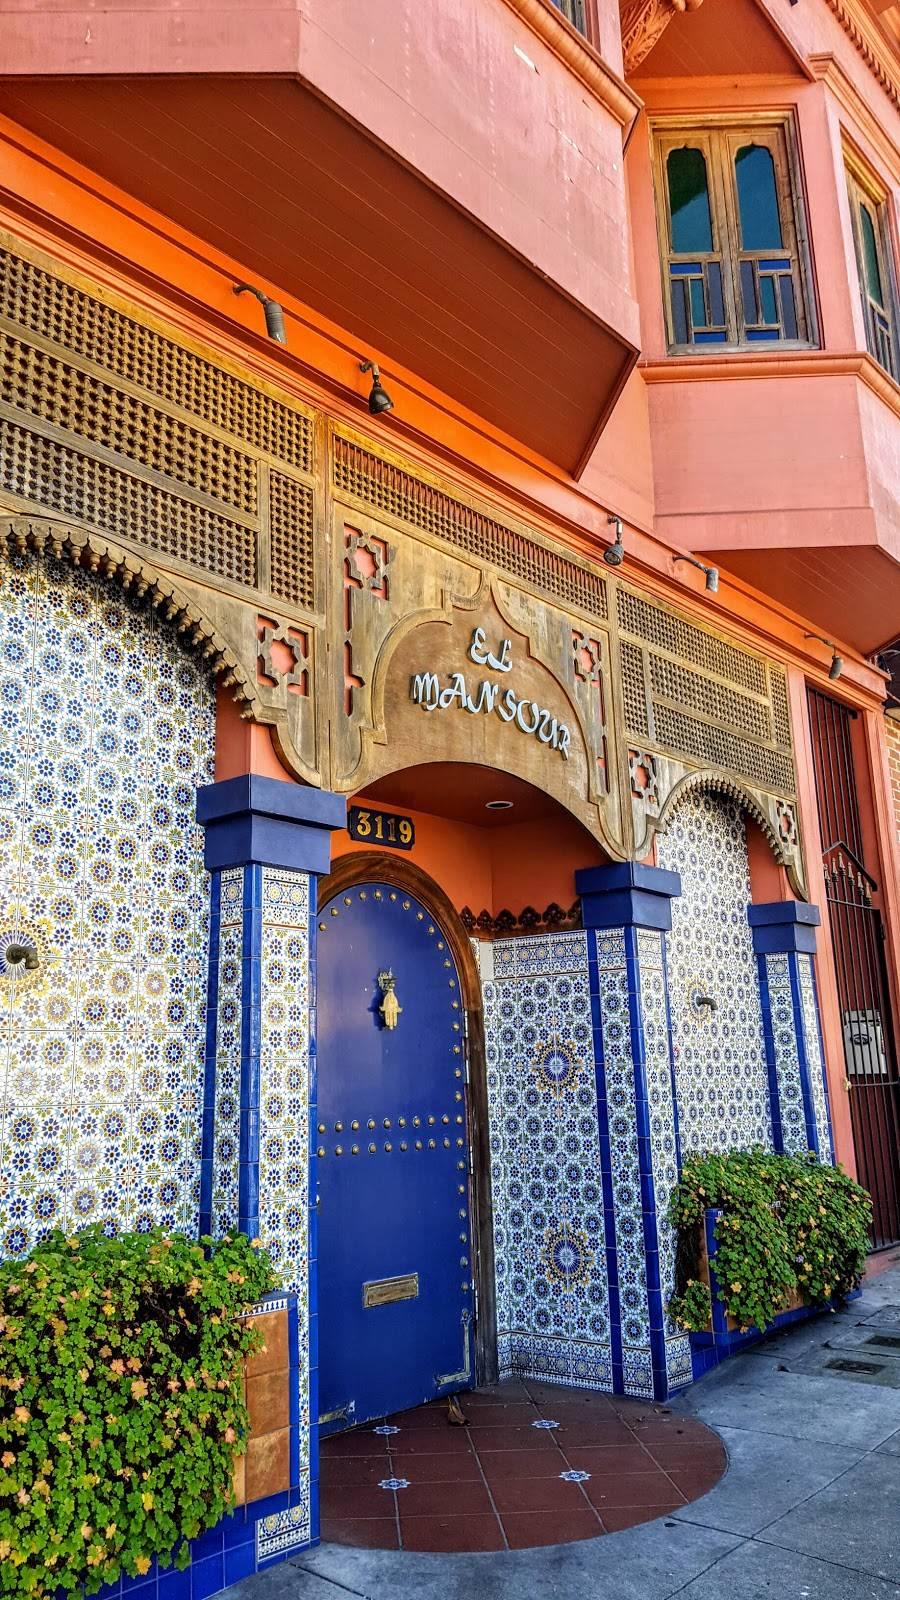 El Mansour   restaurant   3119 Clement St, San Francisco, CA 94121, USA   4157512312 OR +1 415-751-2312